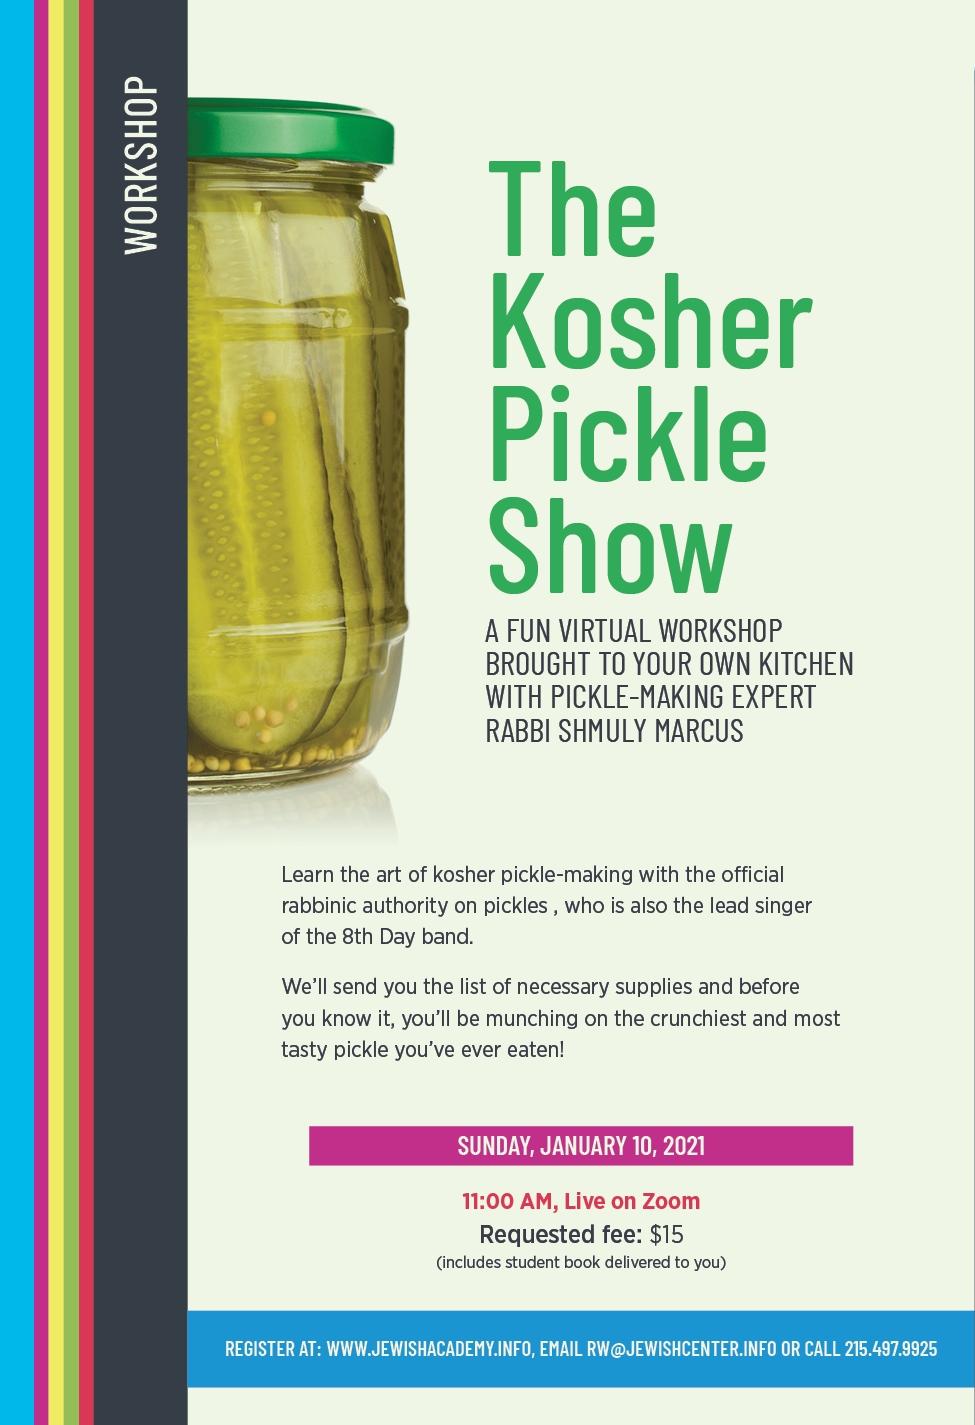 Bucks County Jewish Business Network